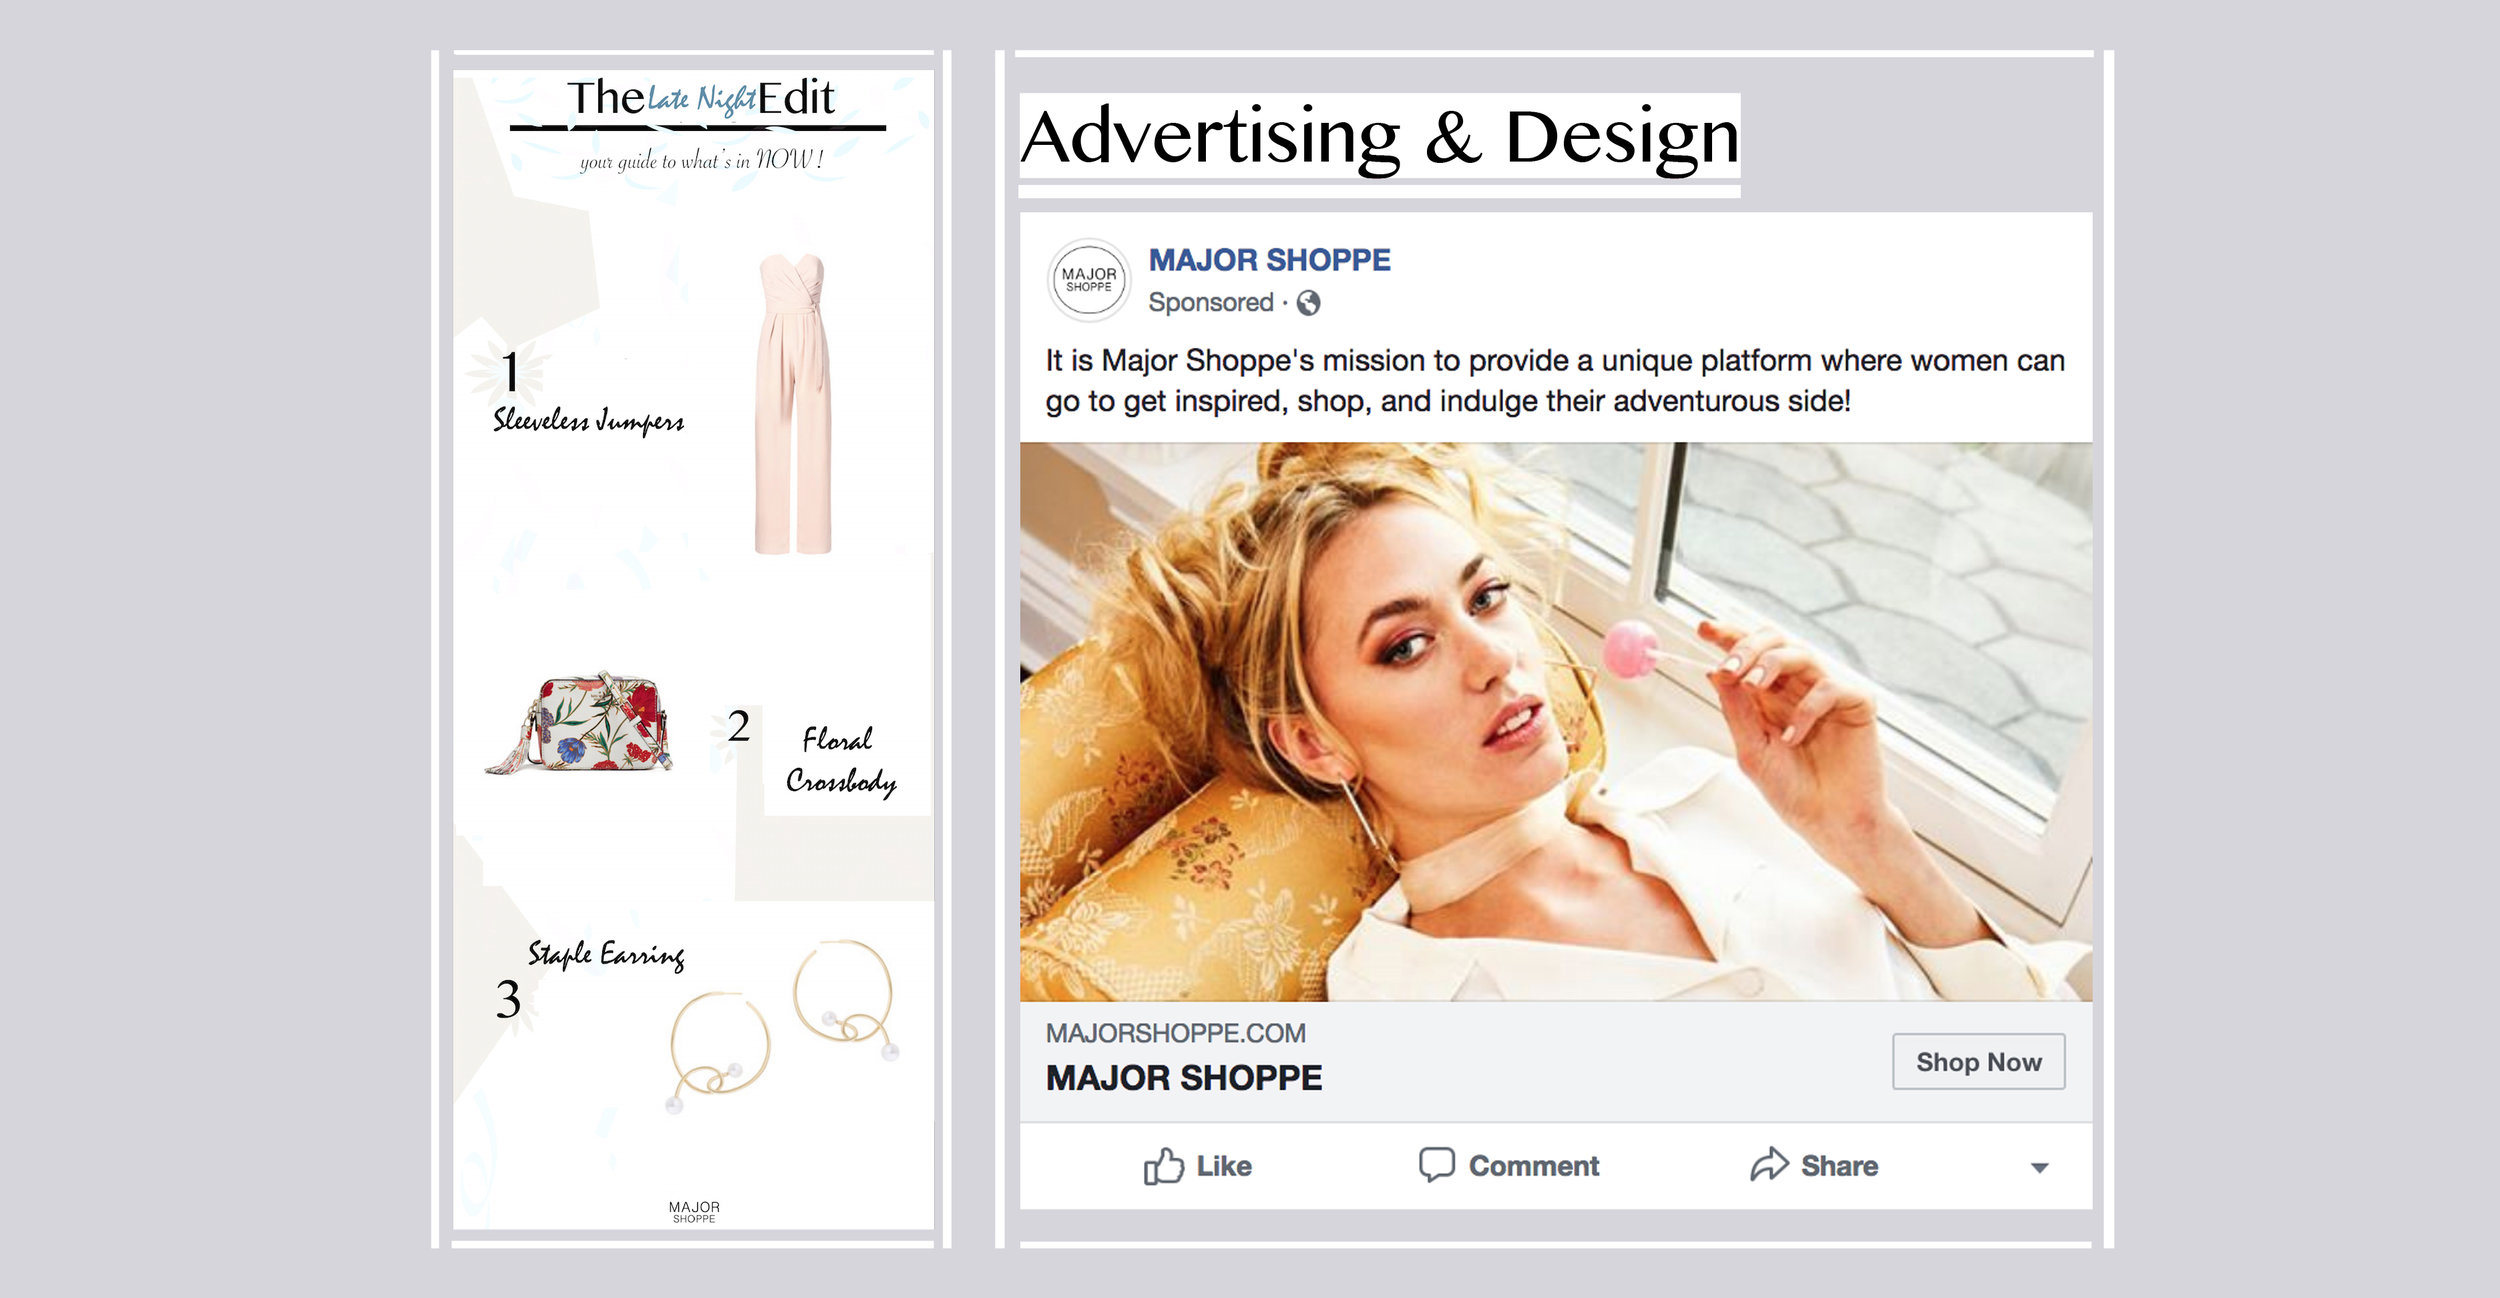 advertisingdesign.jpg